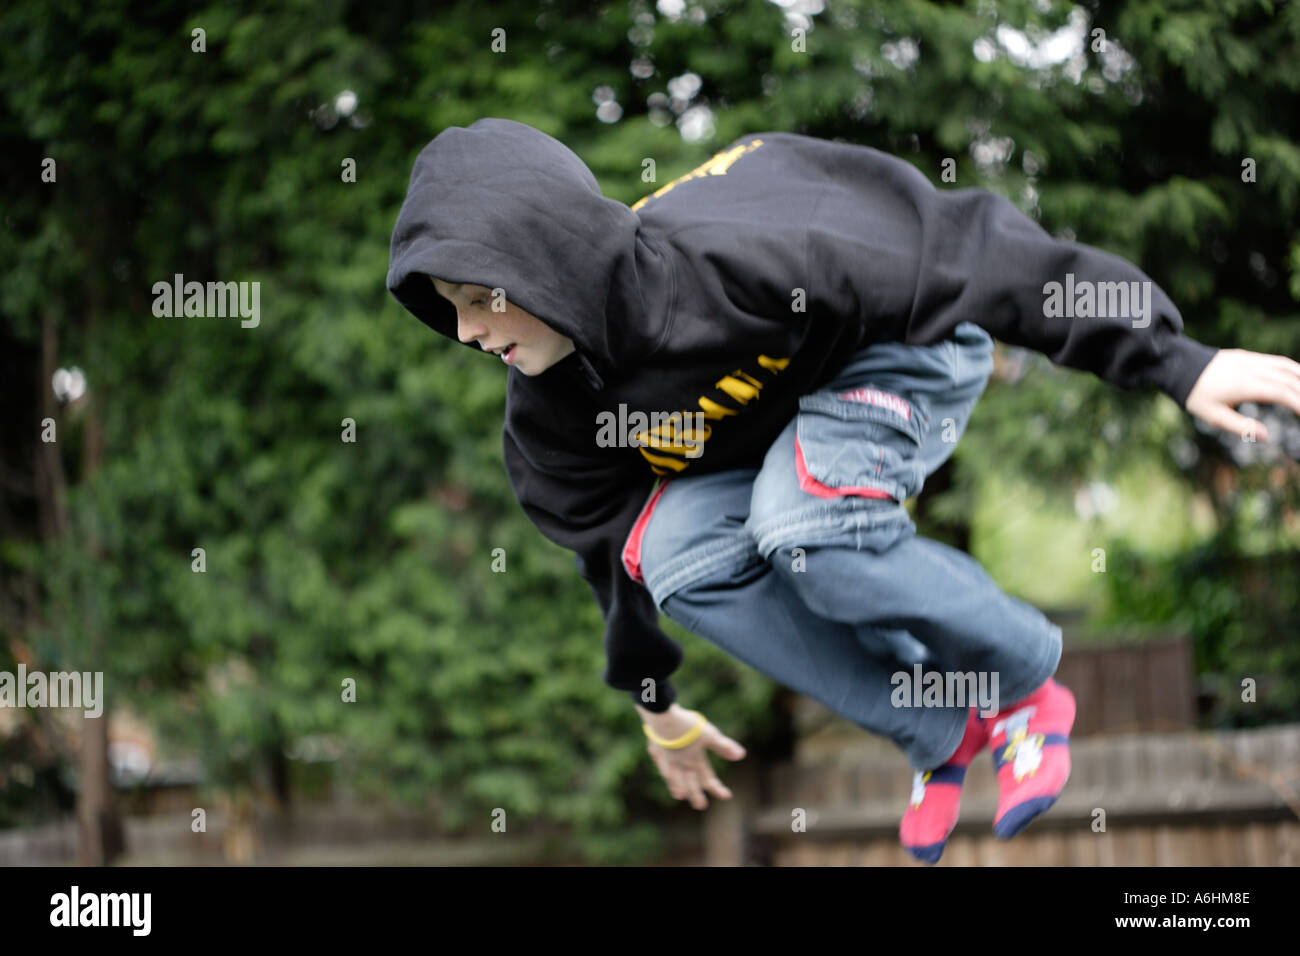 Teenager wearing hoody on trampoline, in suburban garden. - Stock Image